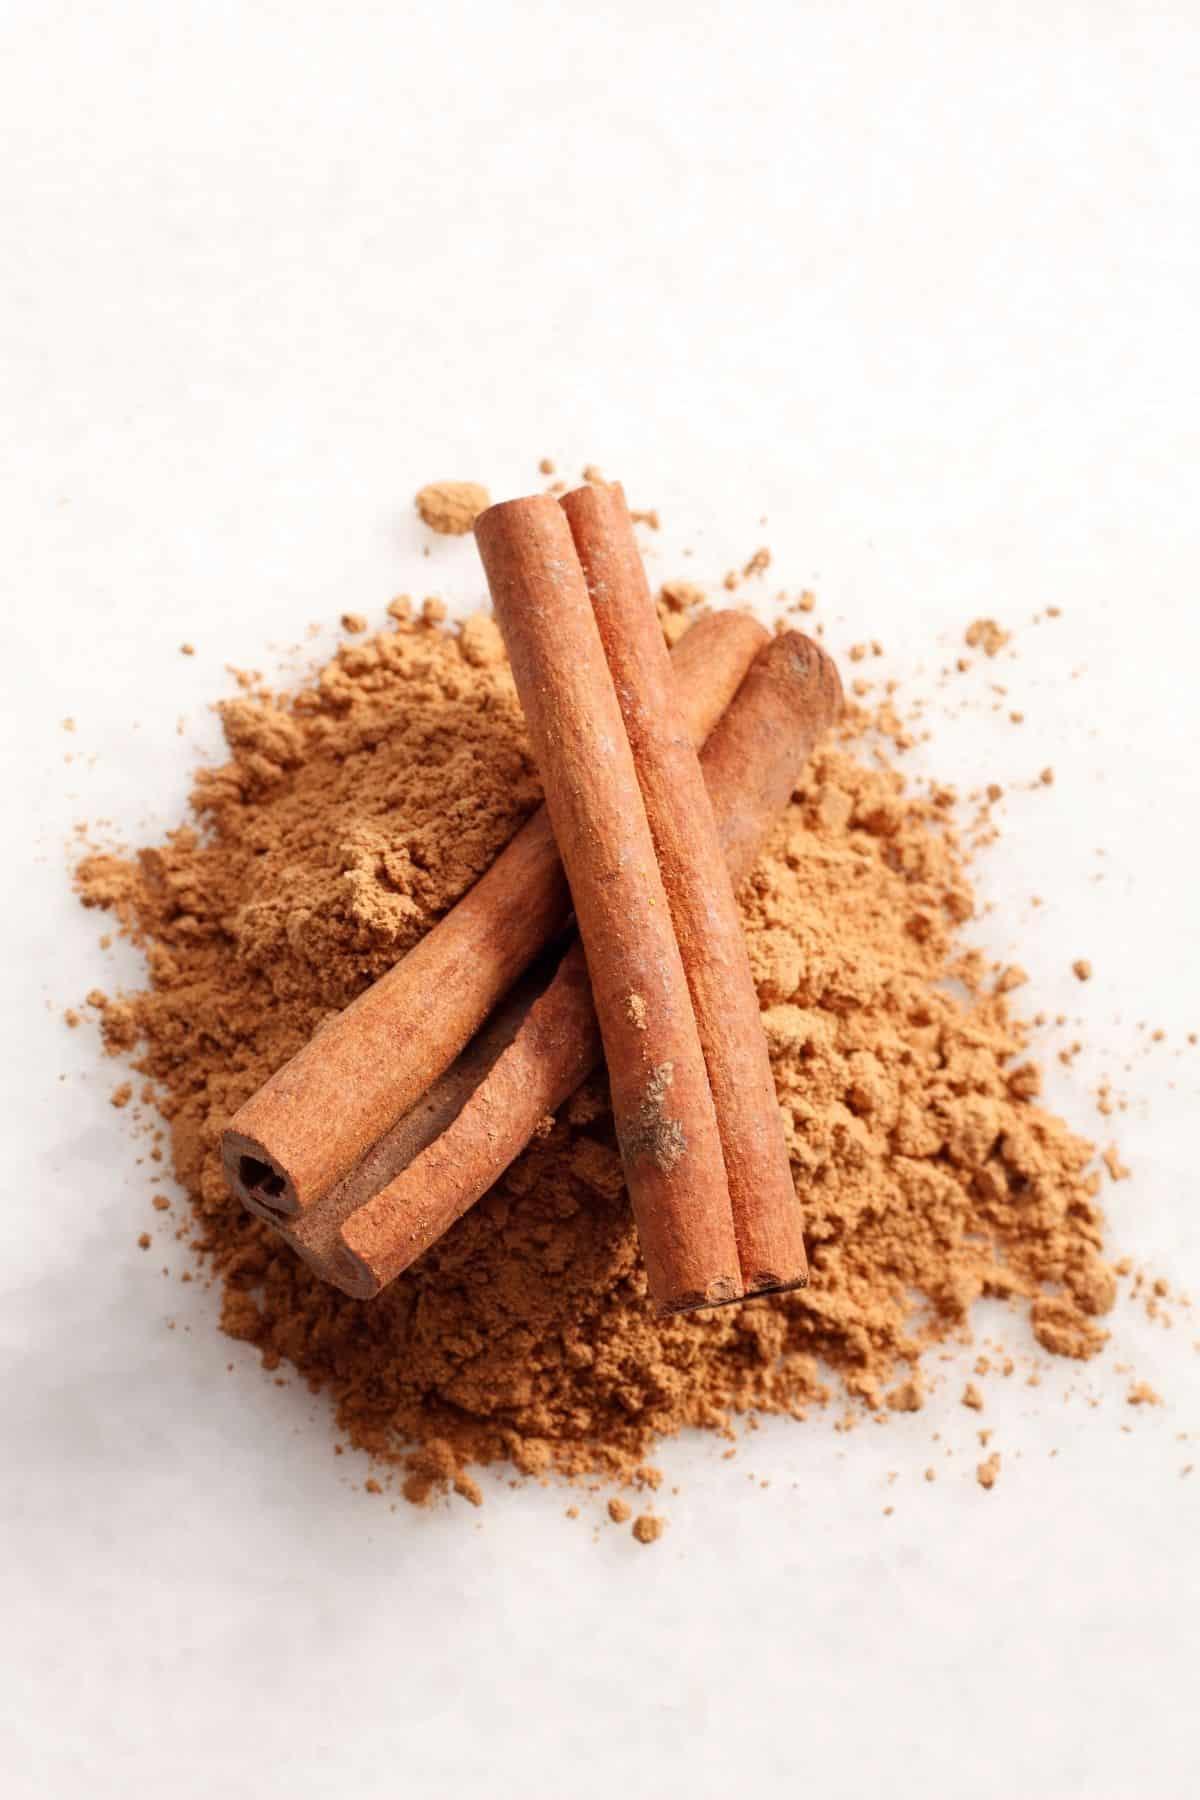 cinnamon sticks and ground cinnamon on a table